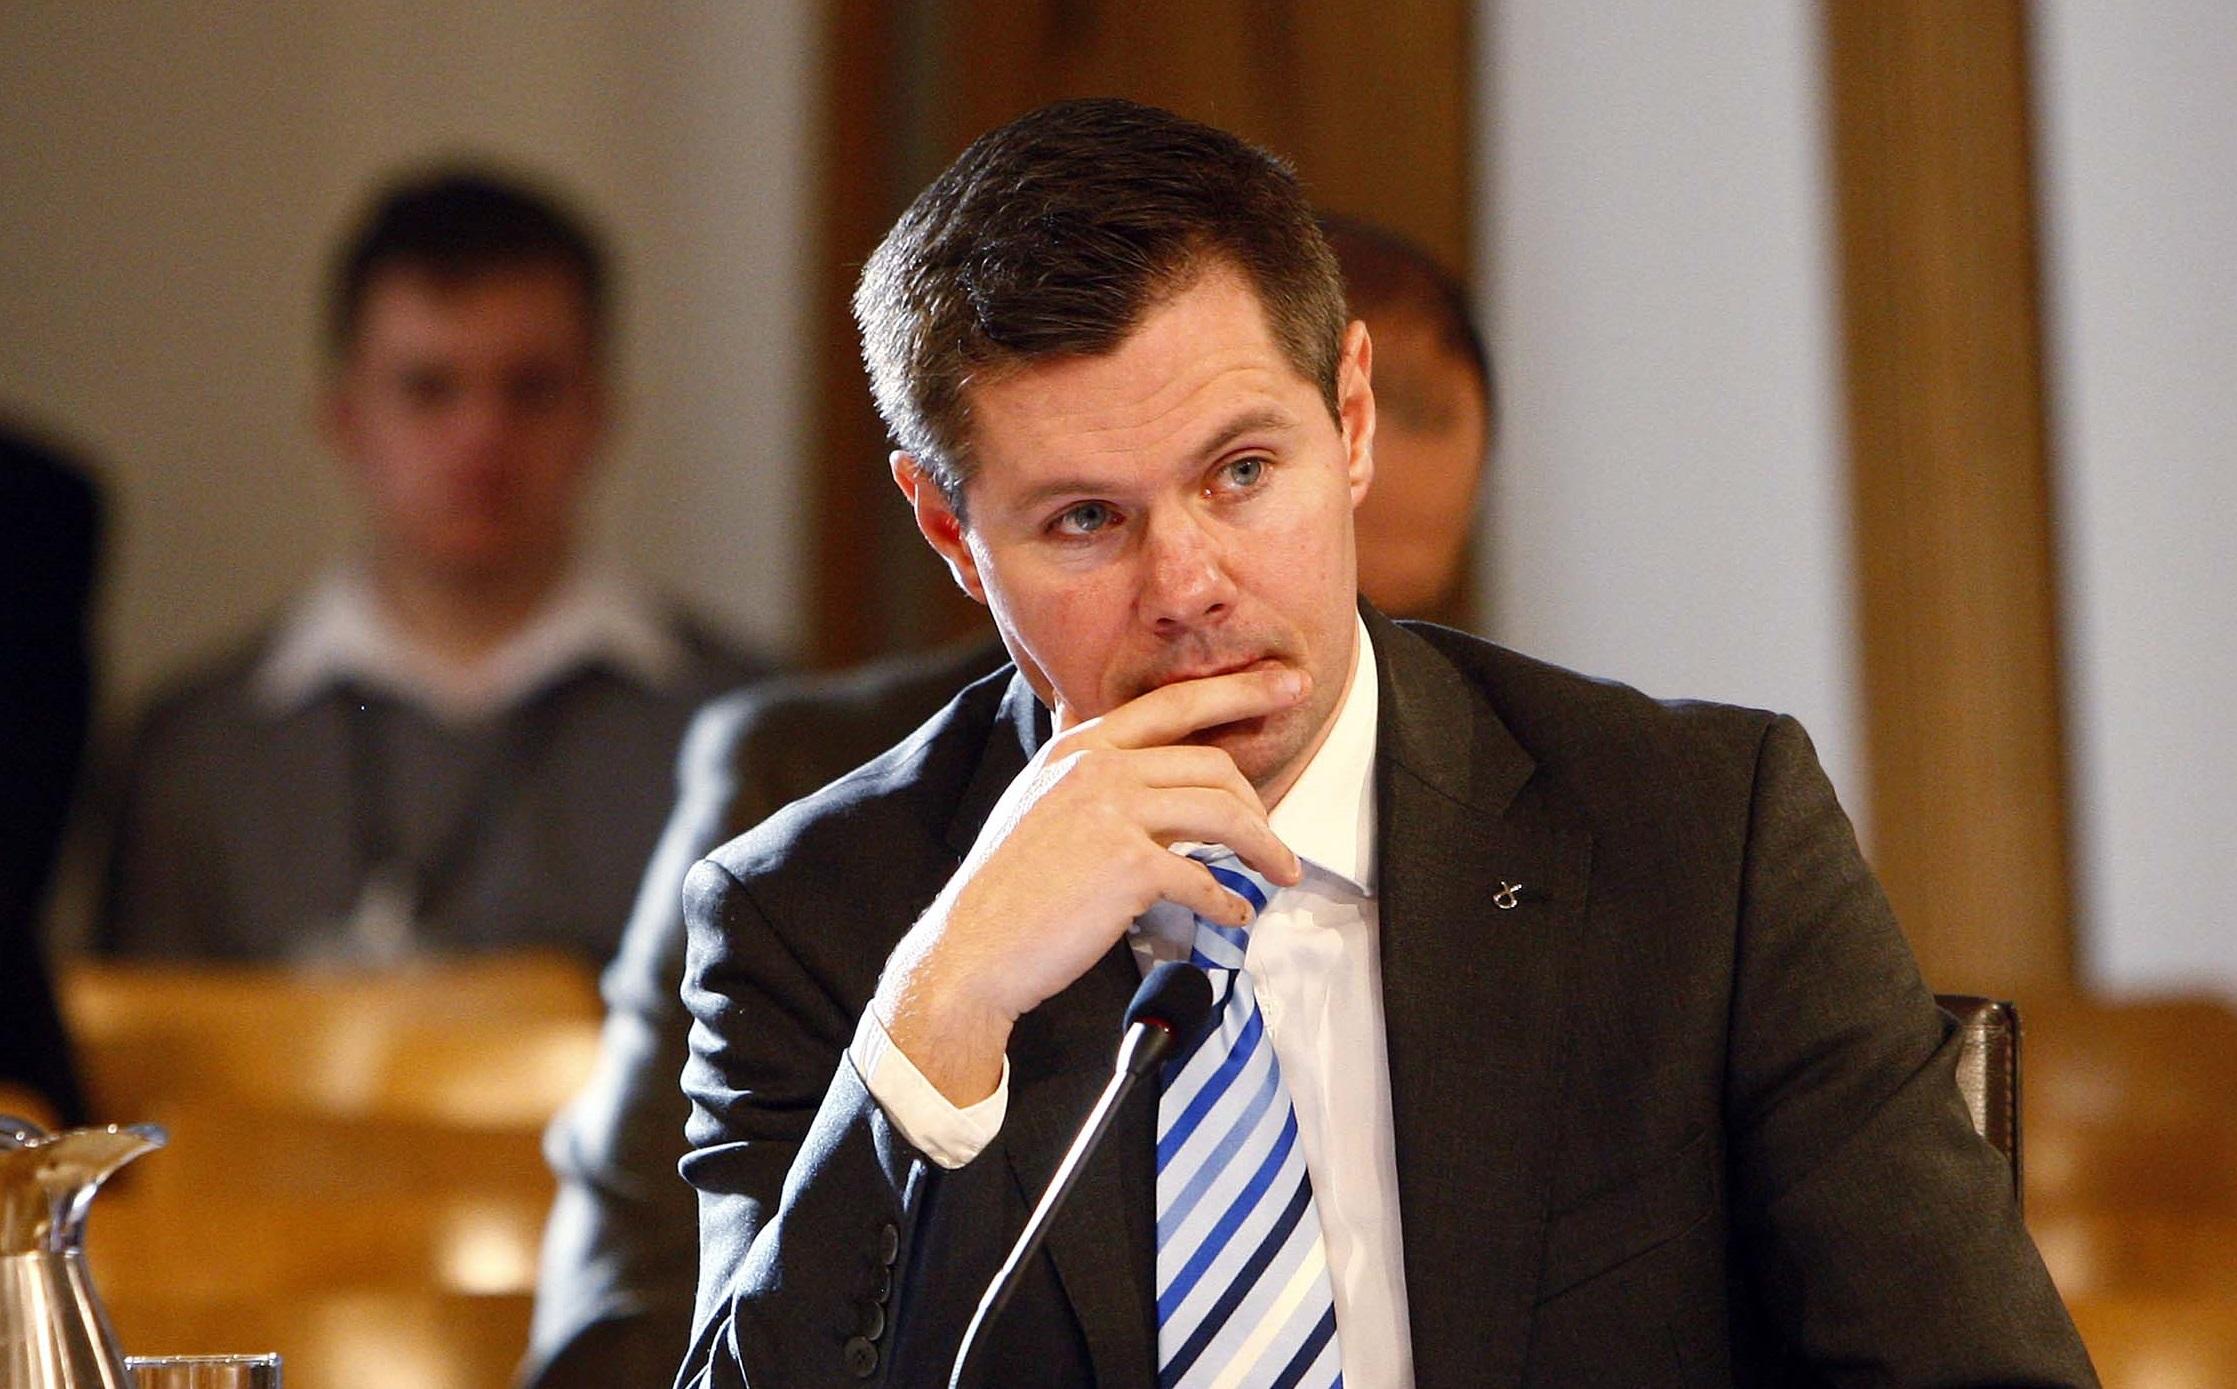 Derek Mackay (Andrew Cowan/Scottish Parliament)